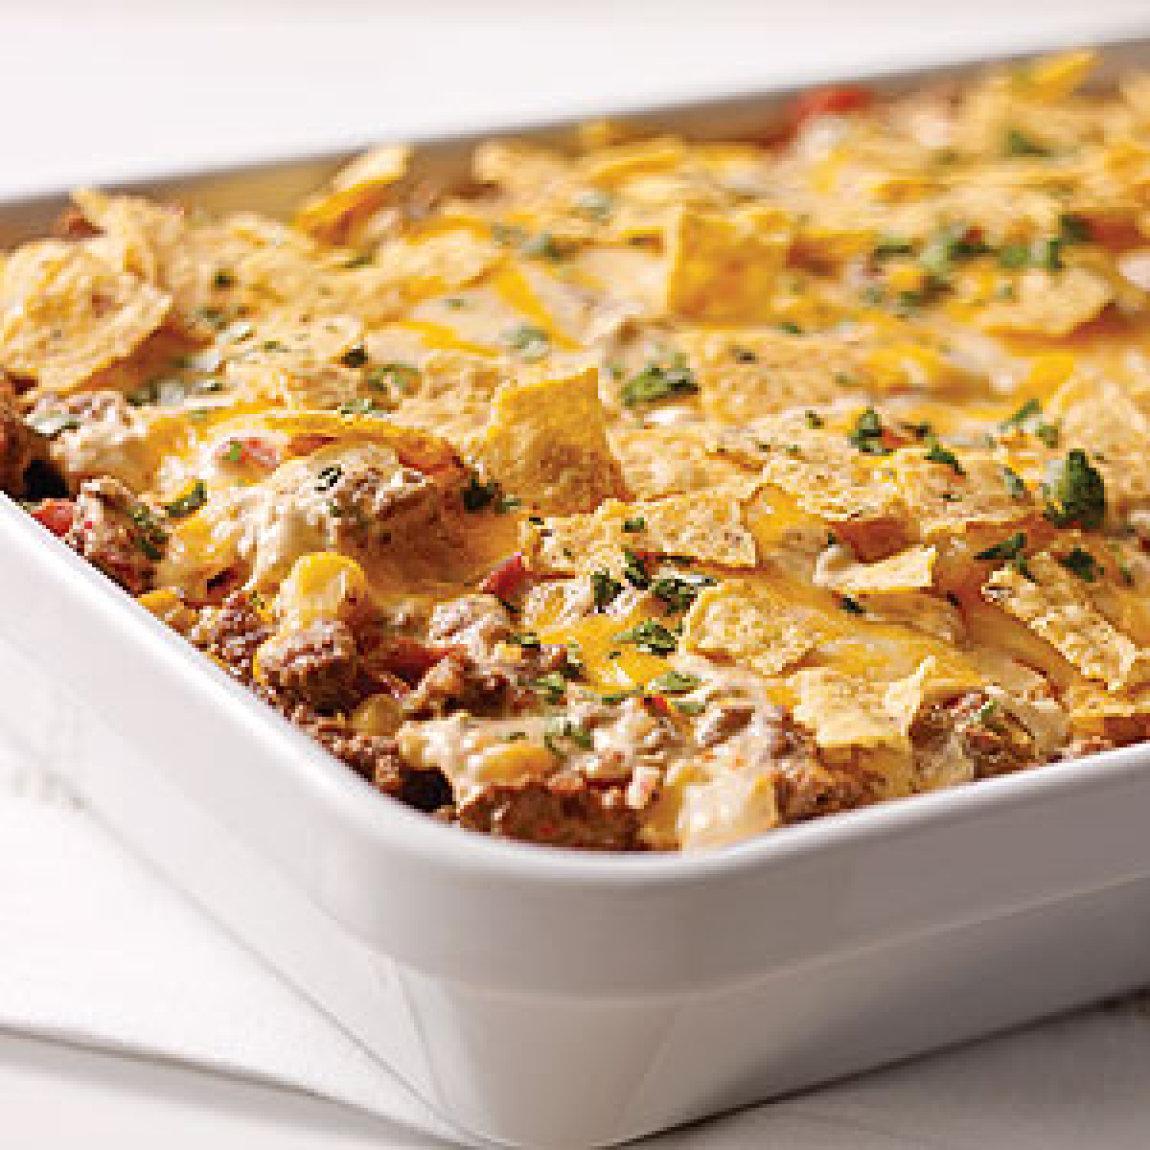 Tex-Mex Beef & Rice Casserole Recipe | Just A Pinch Recipes